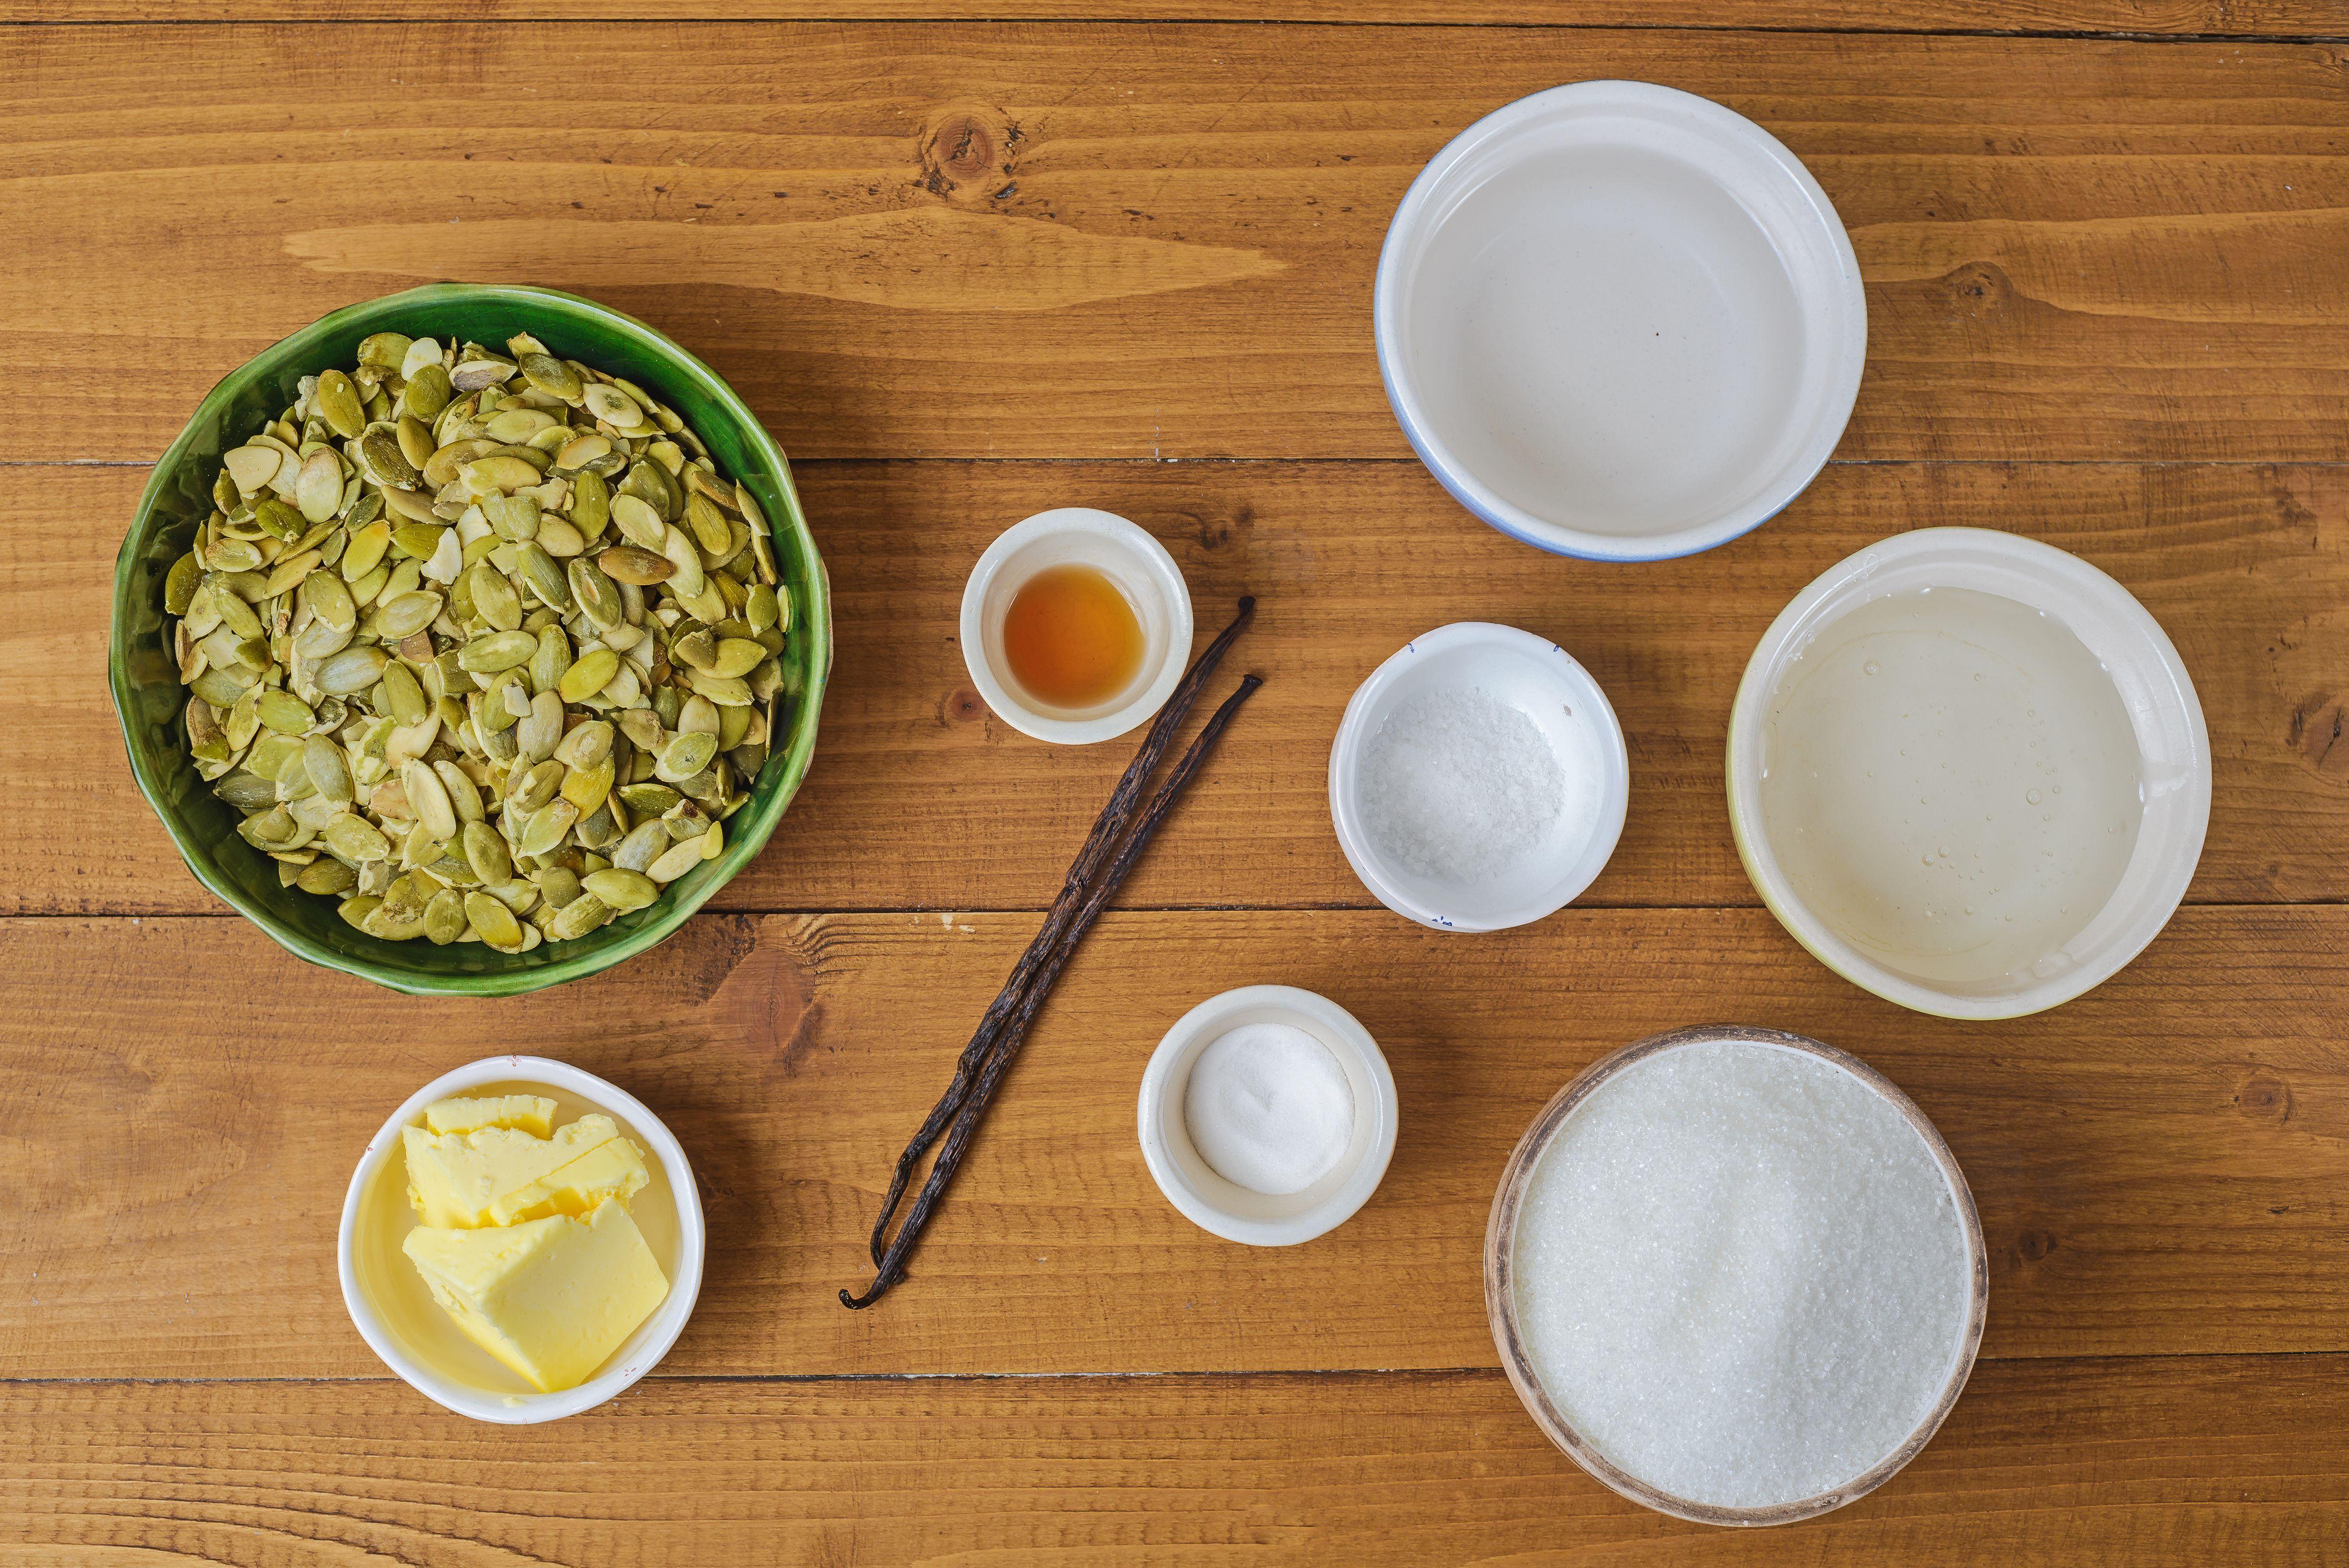 Ingredients for pepita brittle